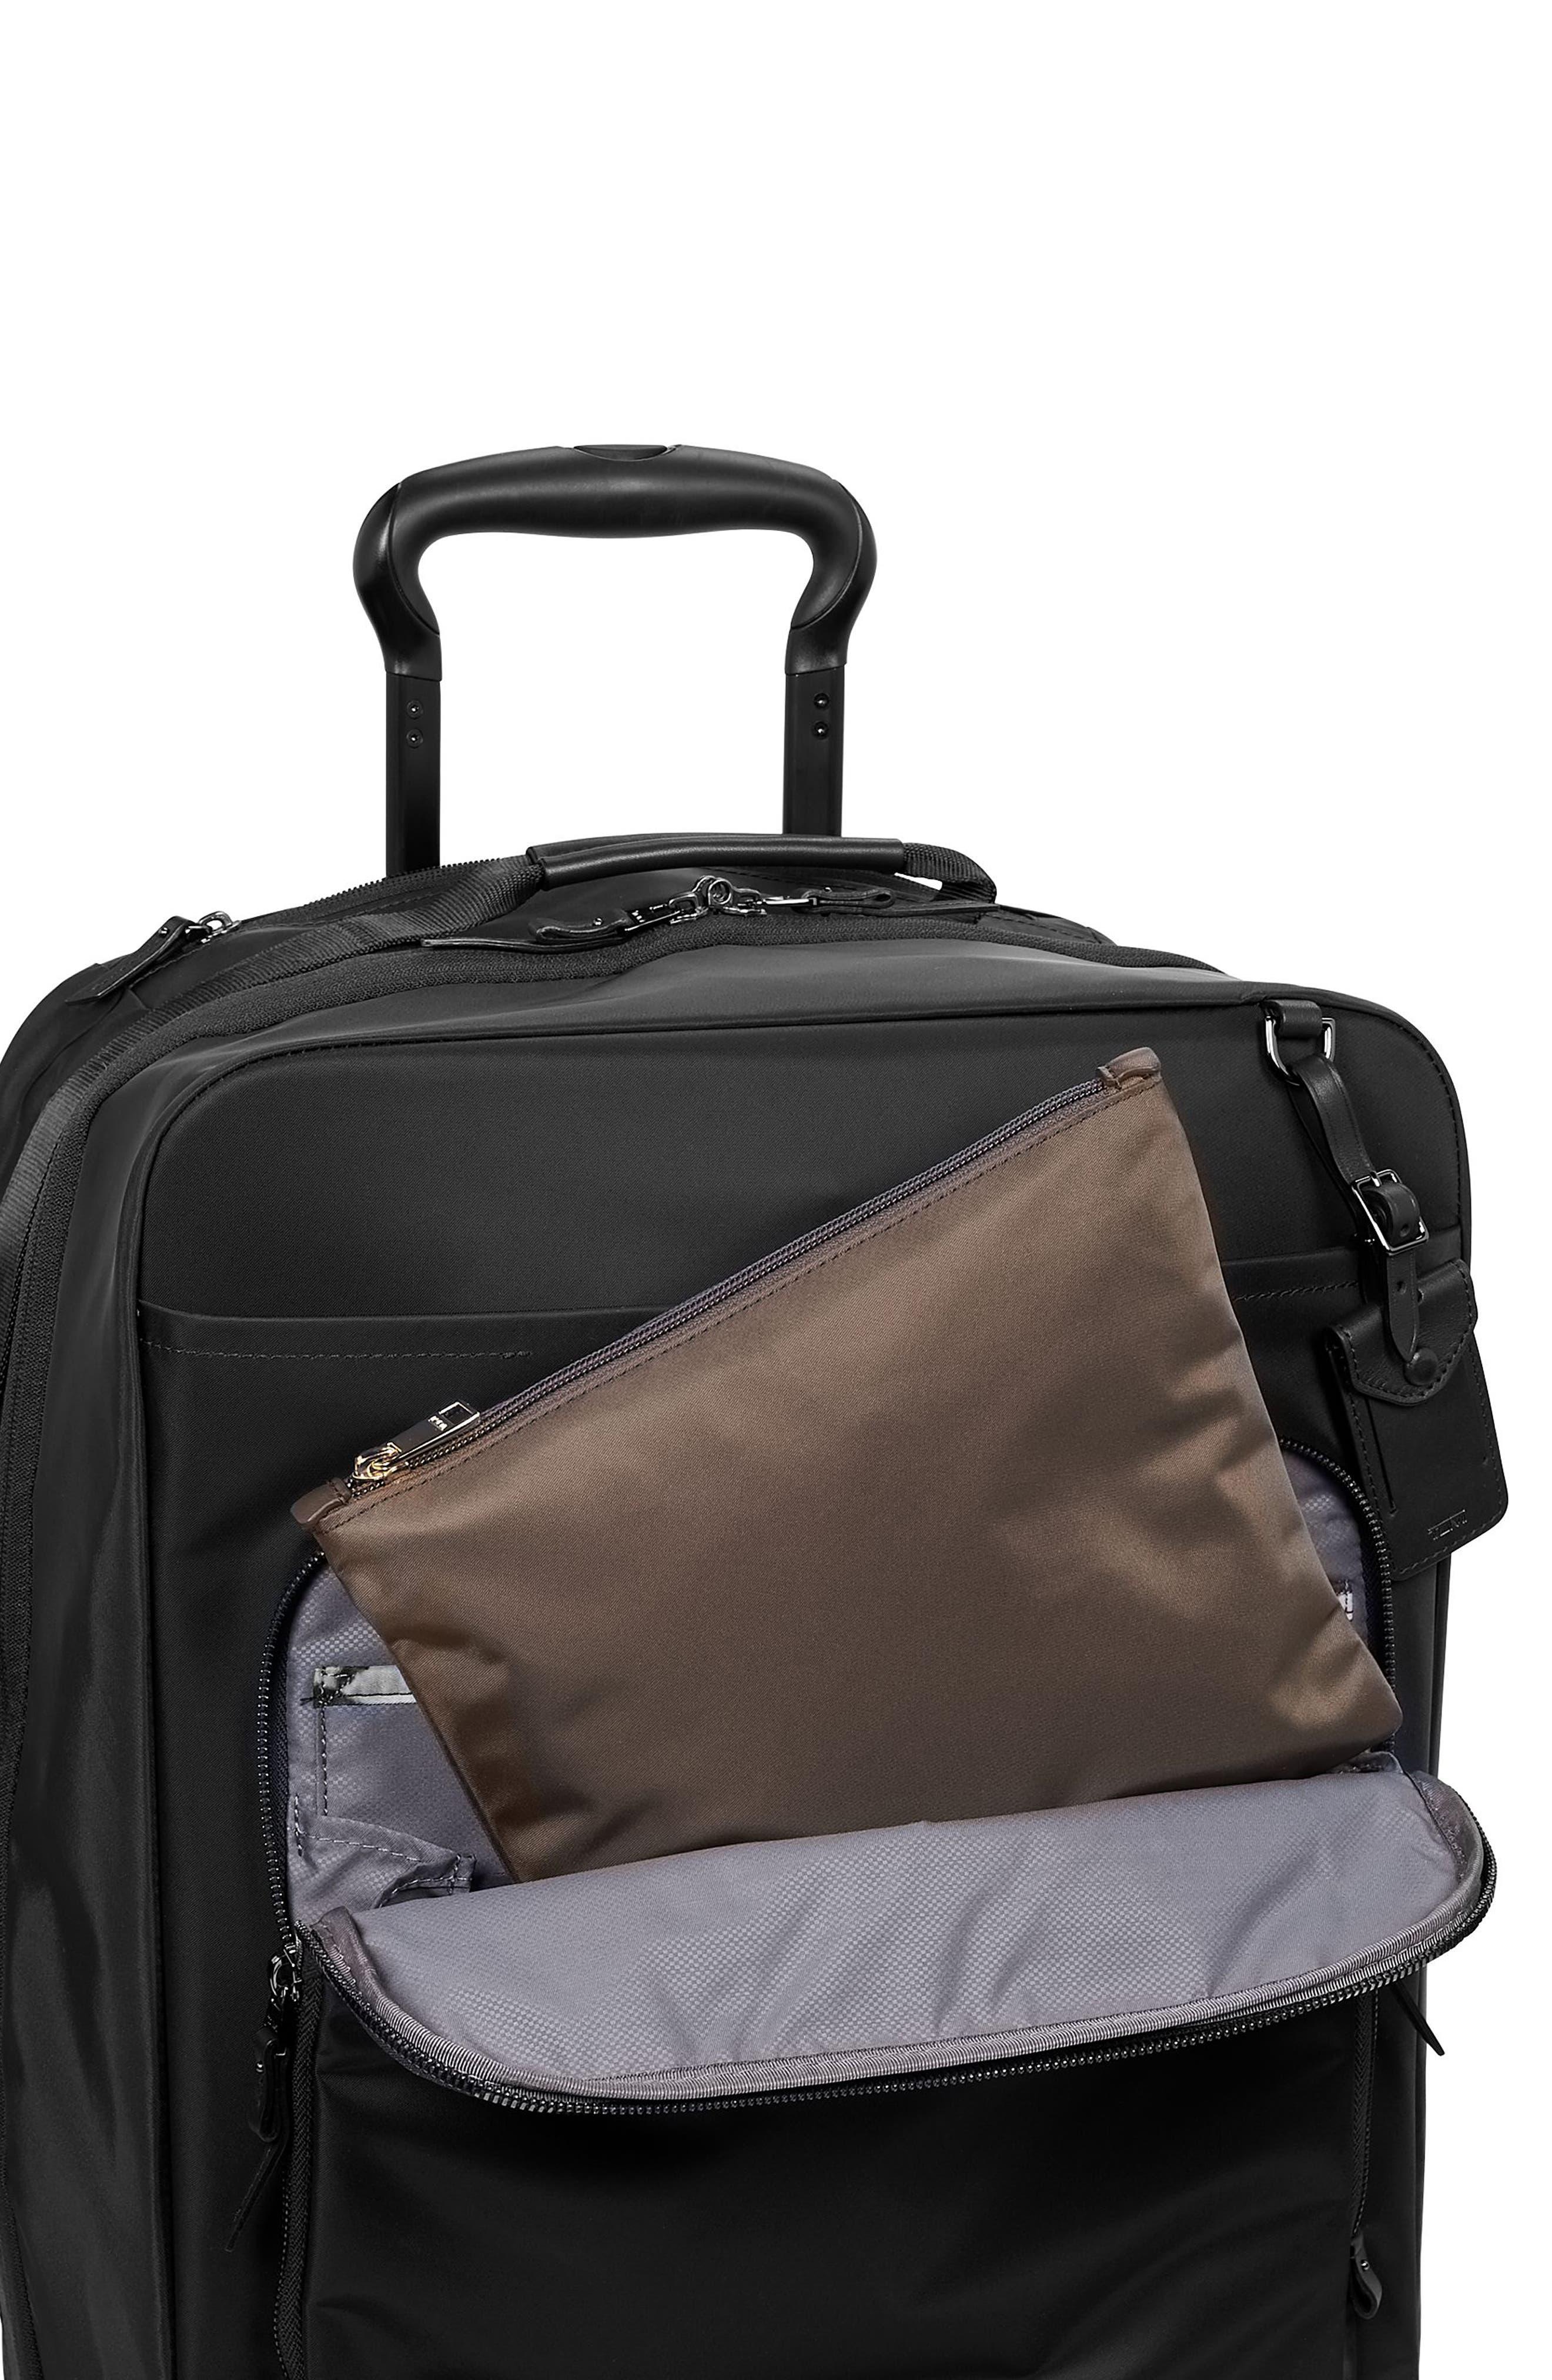 TUMI, Voyageur - Just in Case Nylon Travel Backpack, Alternate thumbnail 5, color, MINK